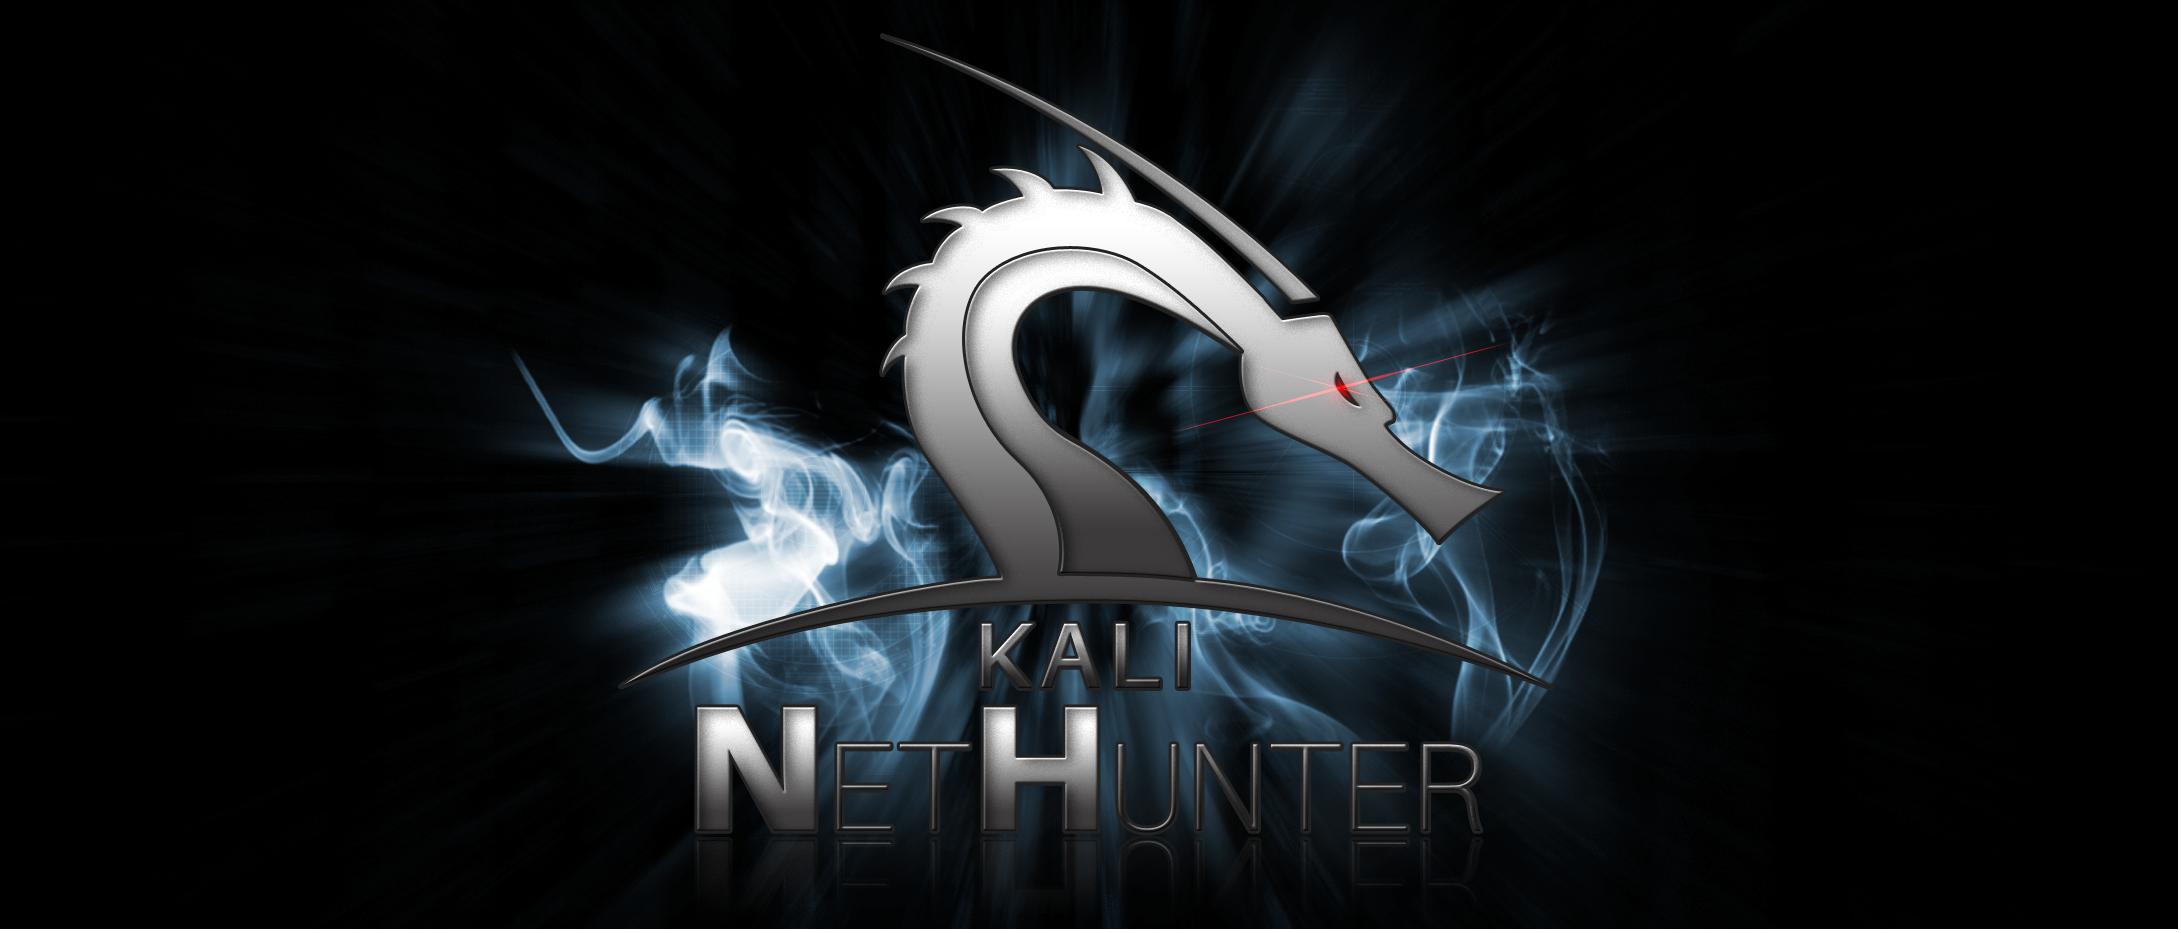 Images Kali Linux NetHunter Release Information Kali Linux Wallpapers 2181x933